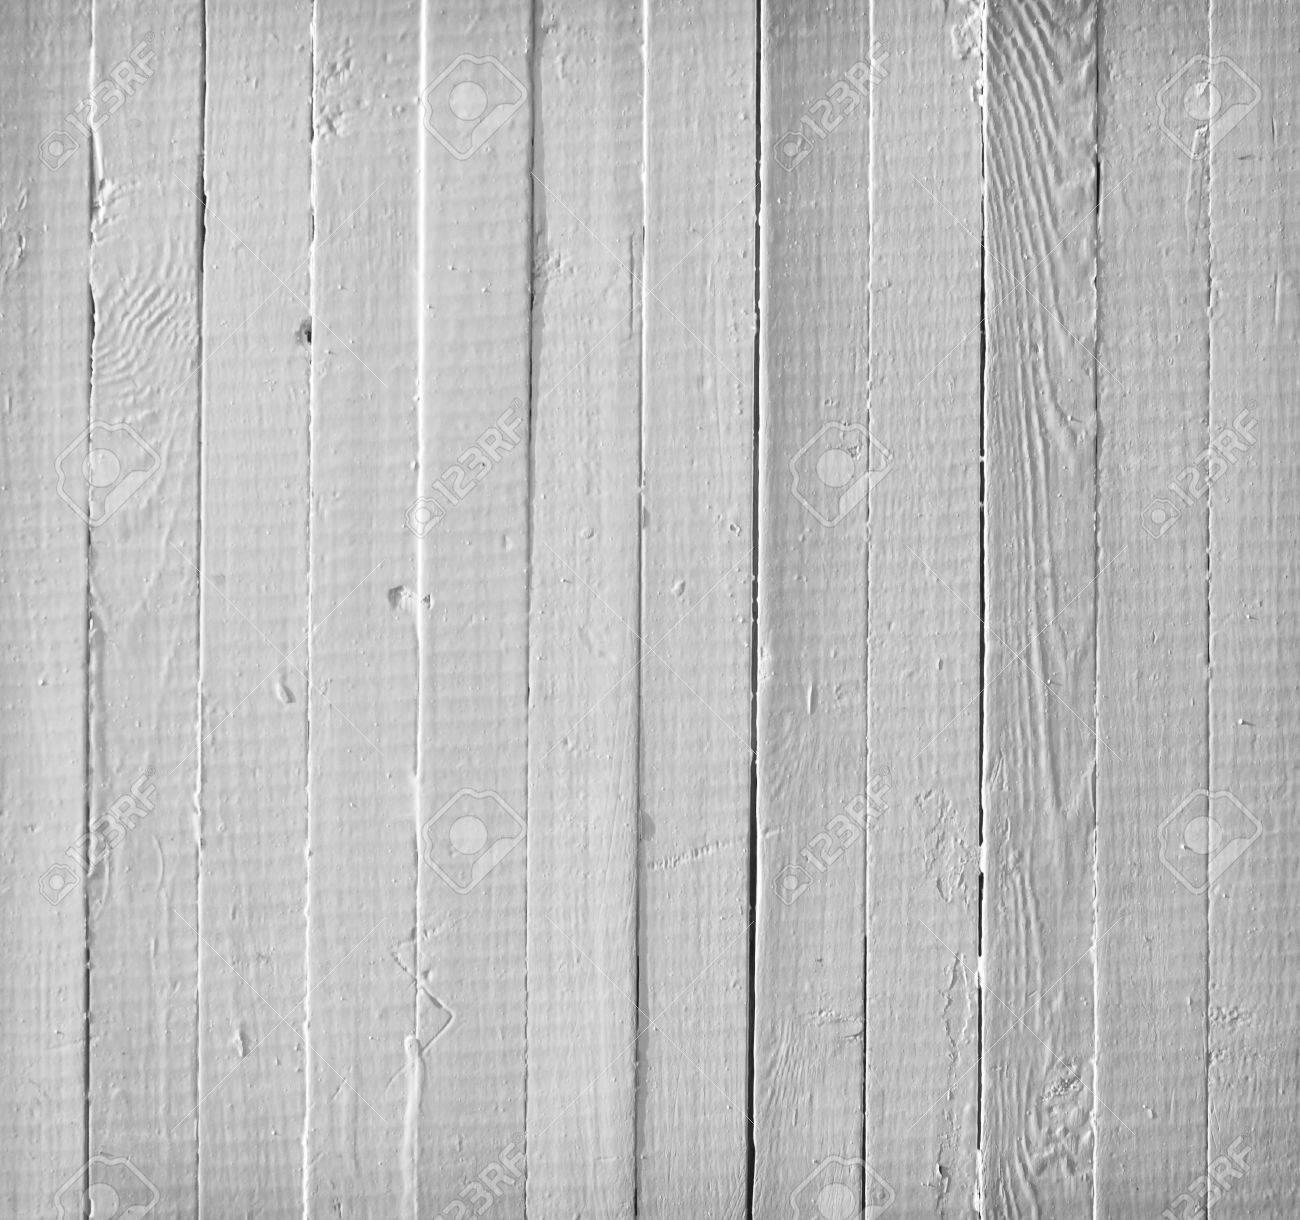 Weathered white wood Stock Photo - 16980549